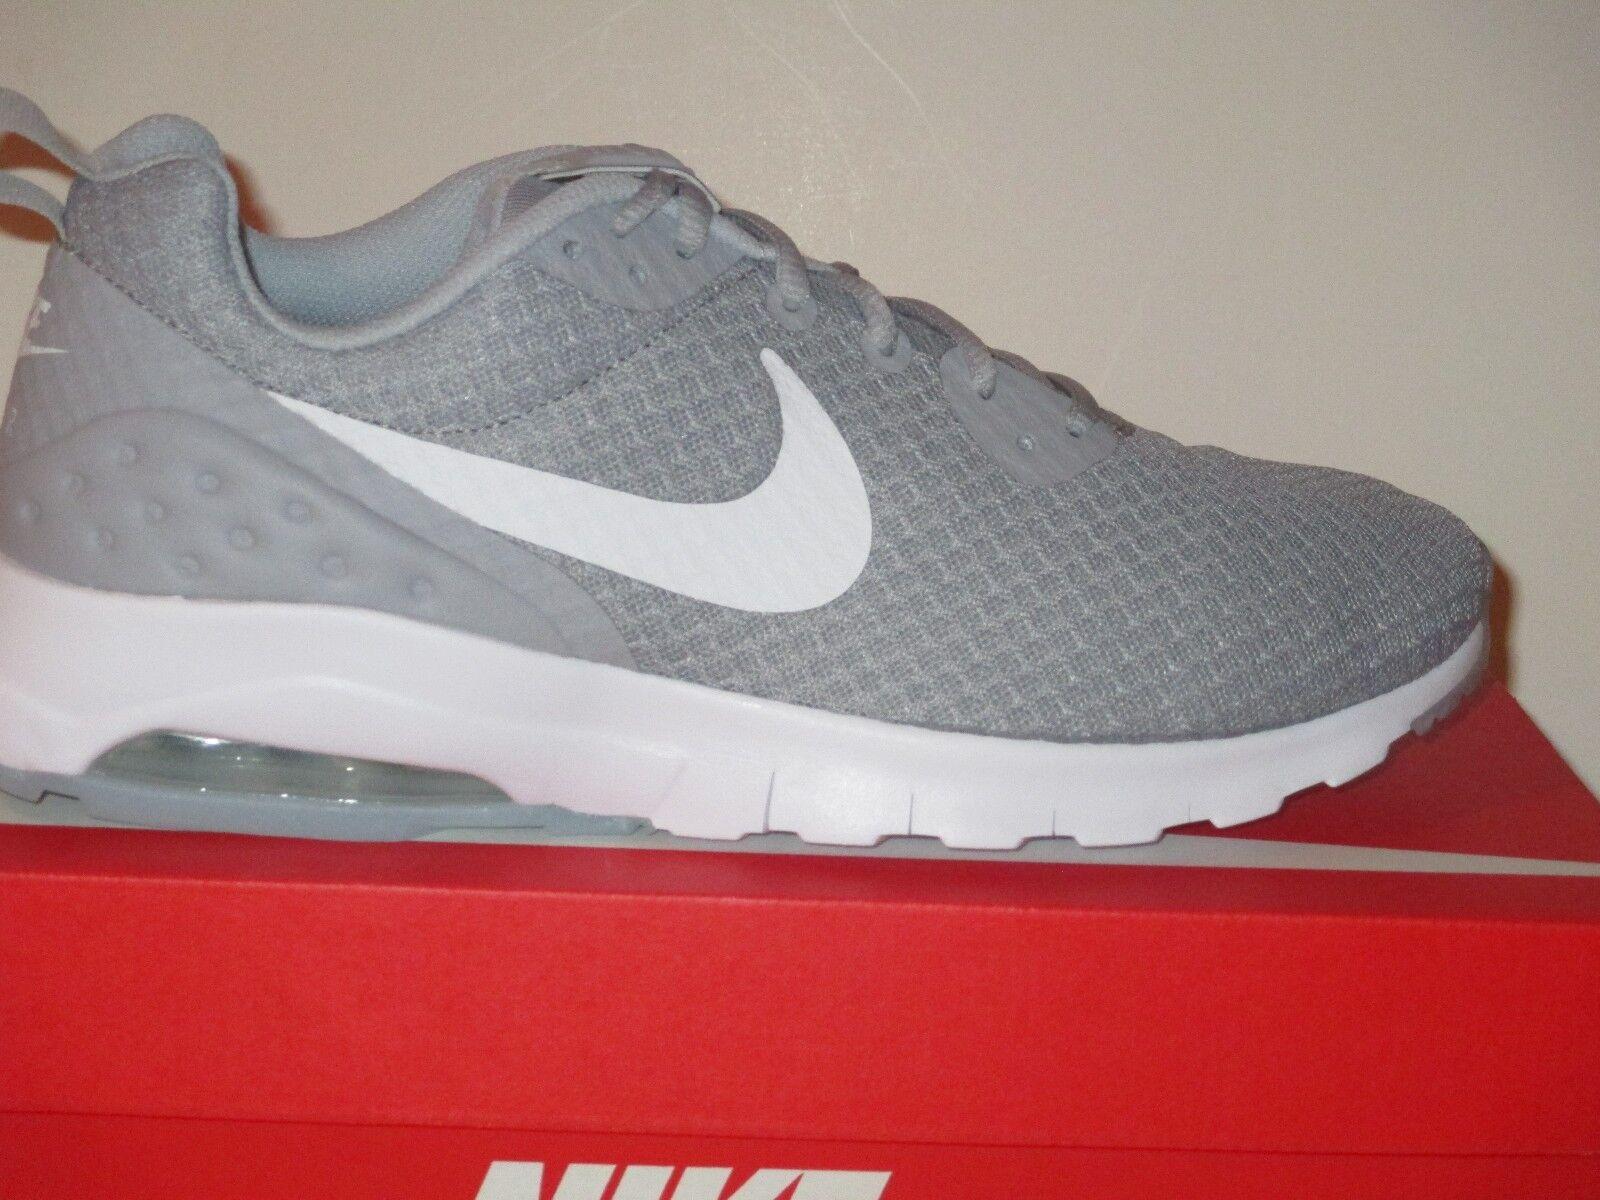 Nike air max proposta - grigio Uomo / bianco (comodit sockliner) Uomo grigio f88b60